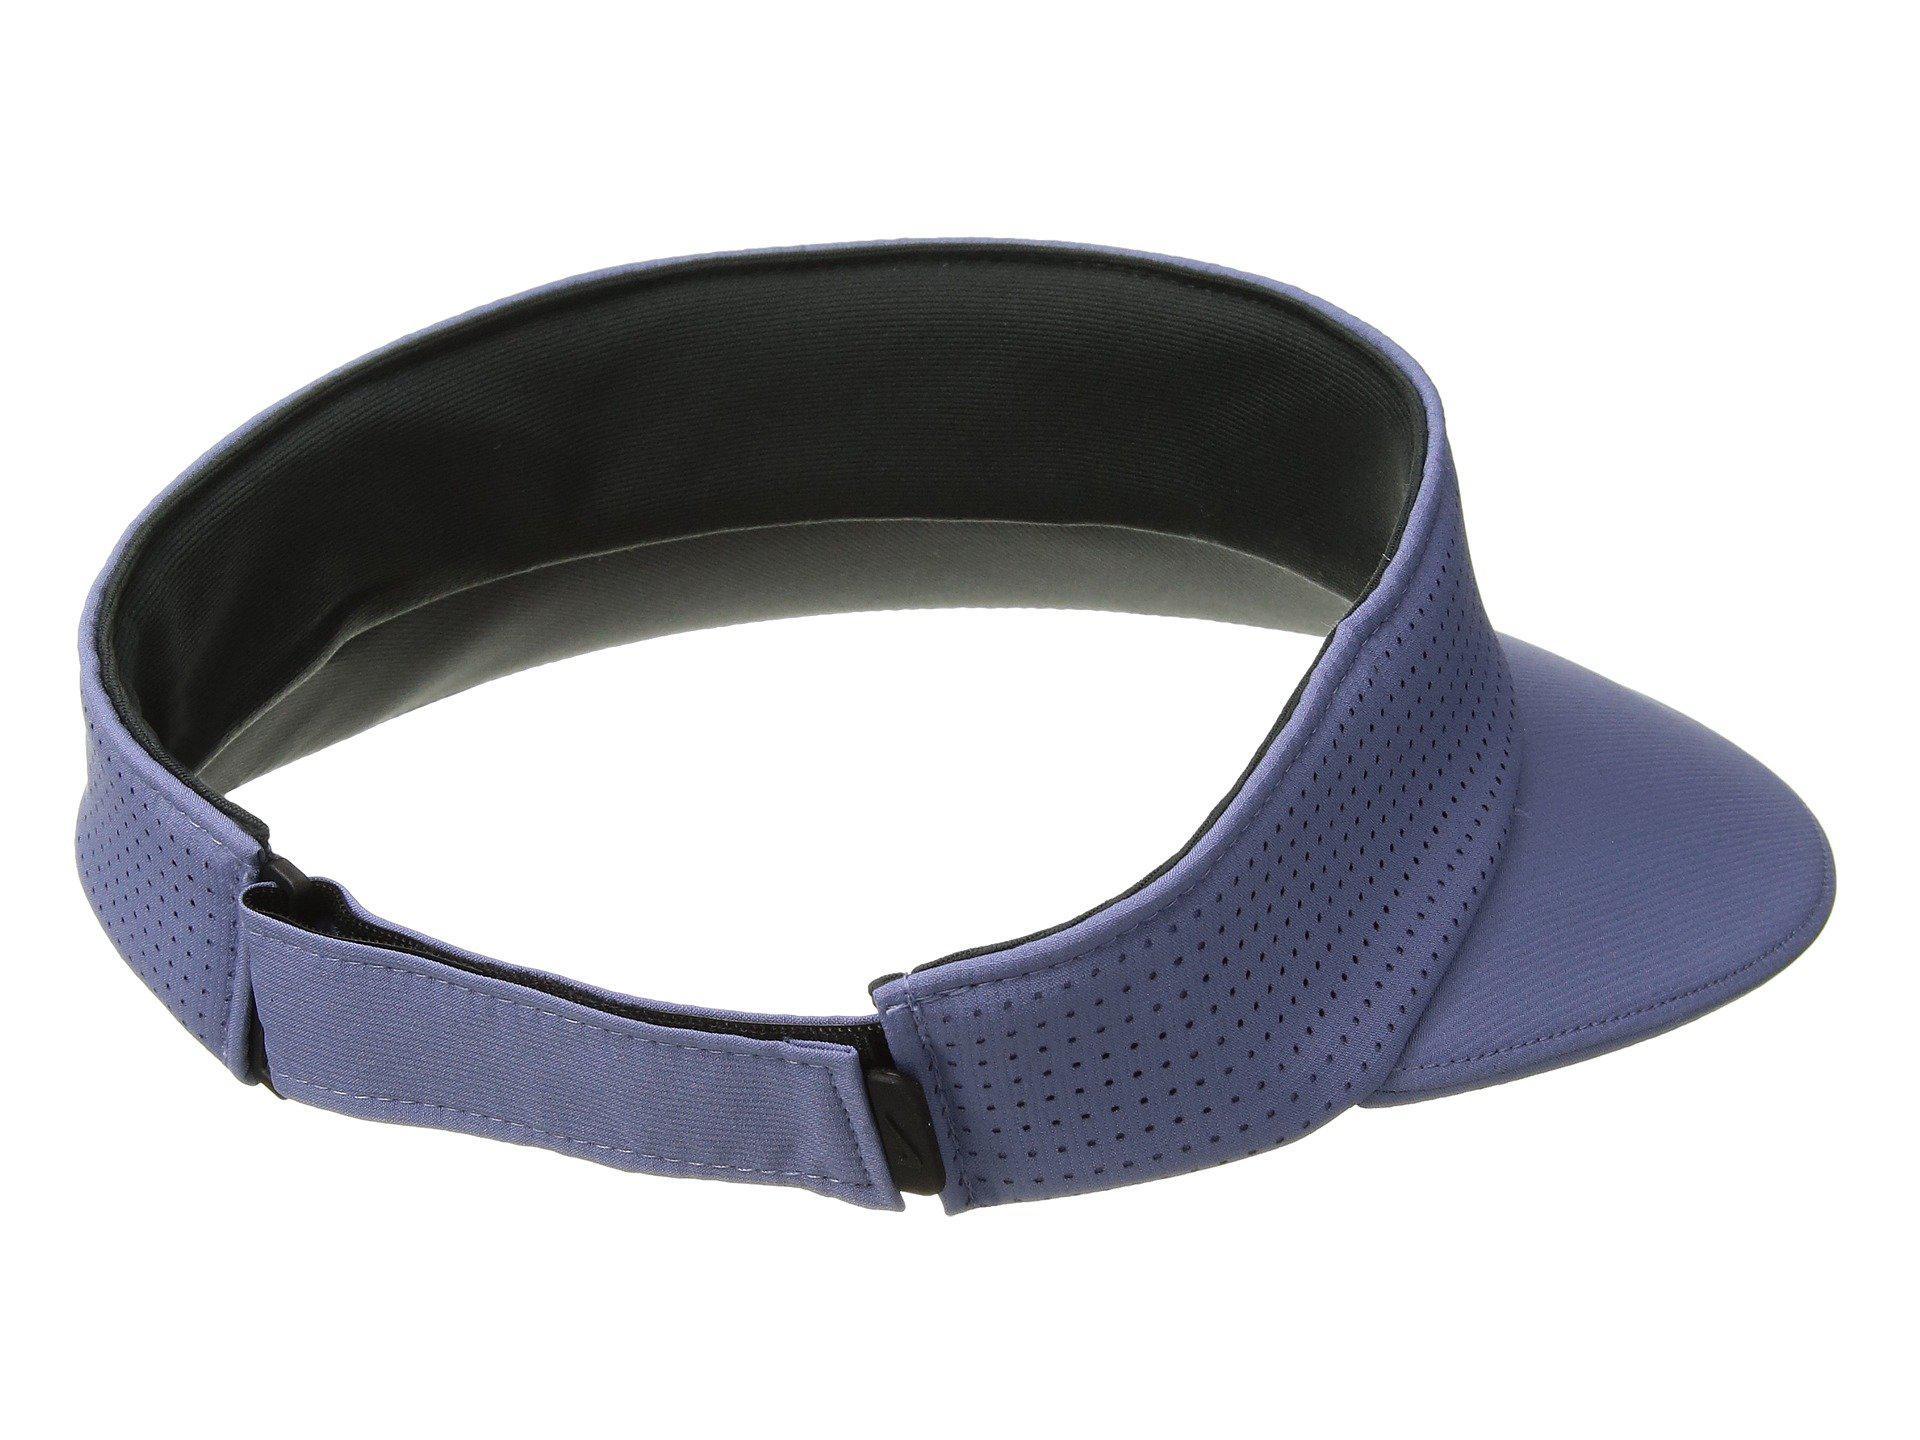 3a0ac4cf4a350 Lyst - Nike Aerobill Visor Big Bill (purple Slate anthracite white ...